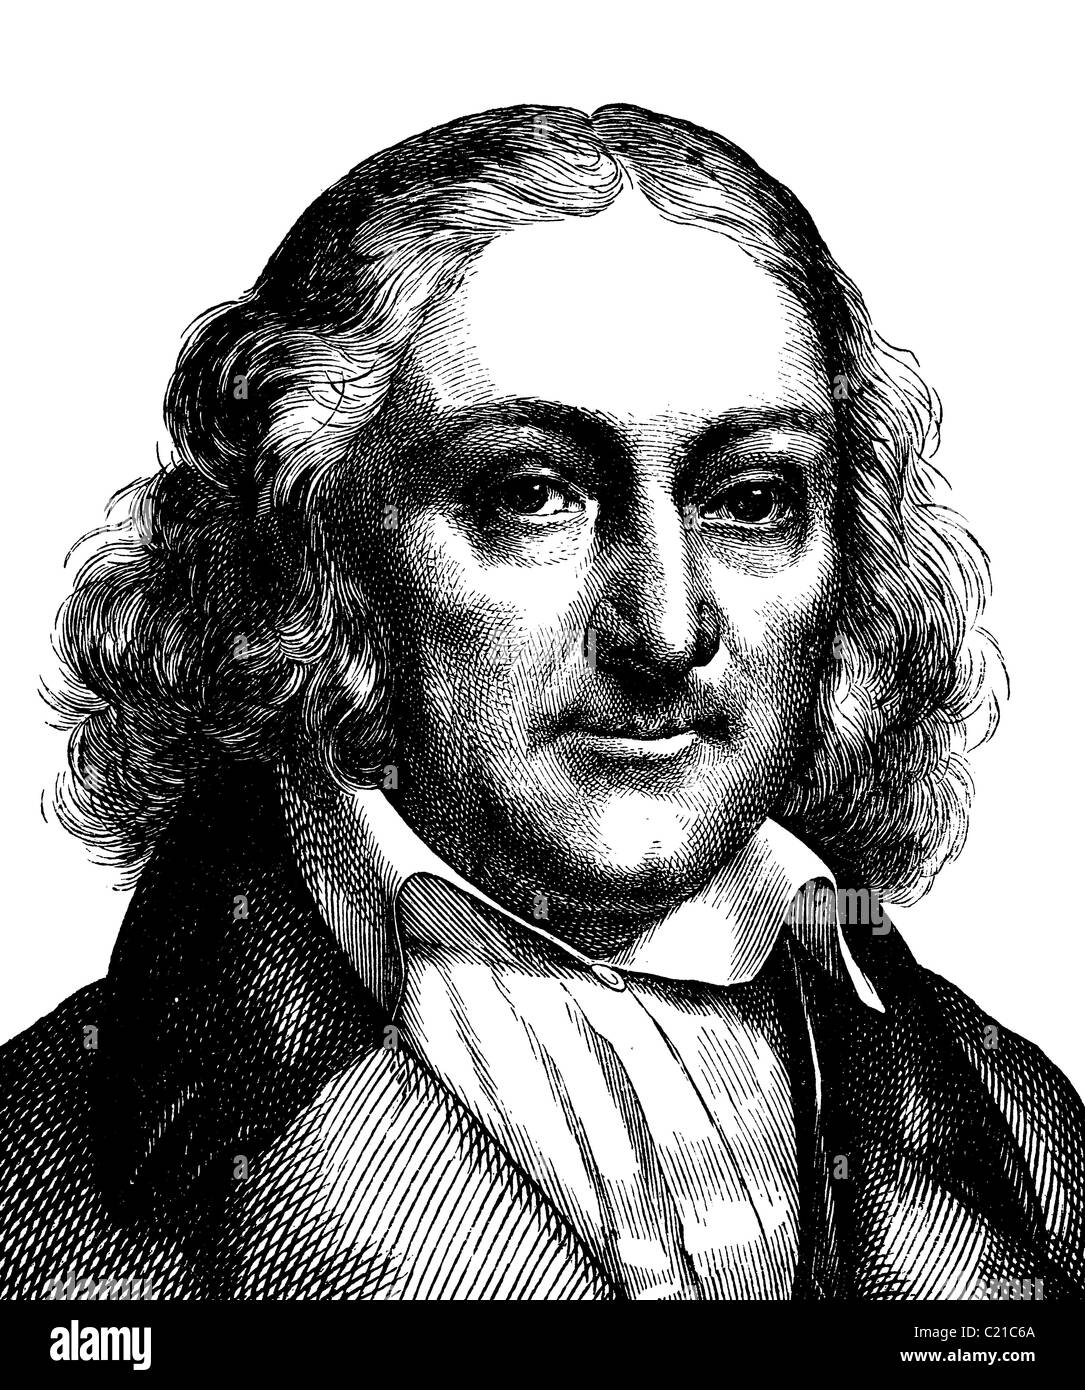 Digital improved image of Georg Andreas Reimer, 1776 - 1842, German publisher, portrait, historical illustration,Stock Photo